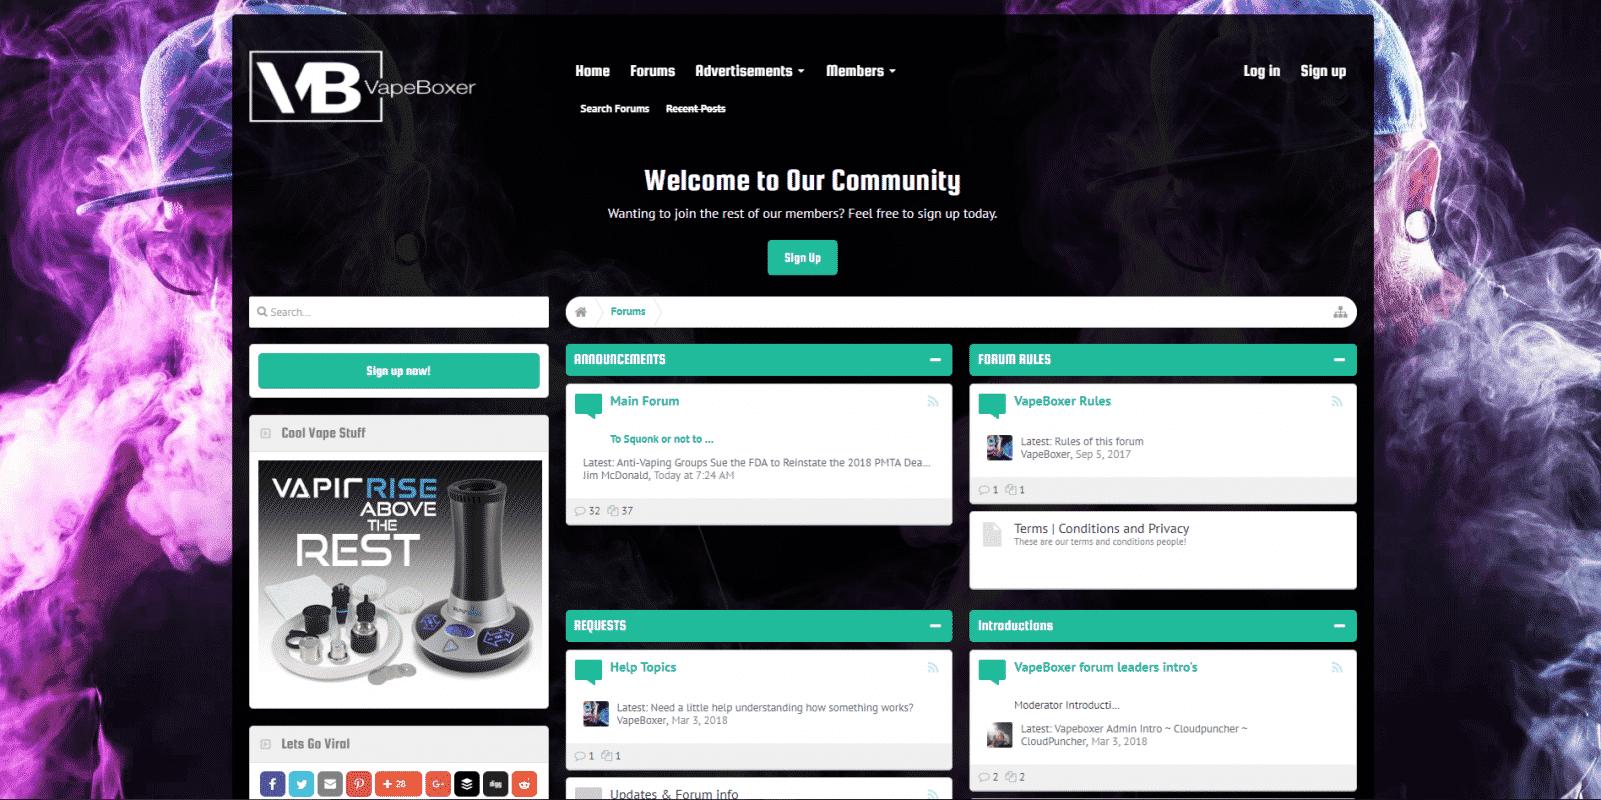 vapeboxer.com website design